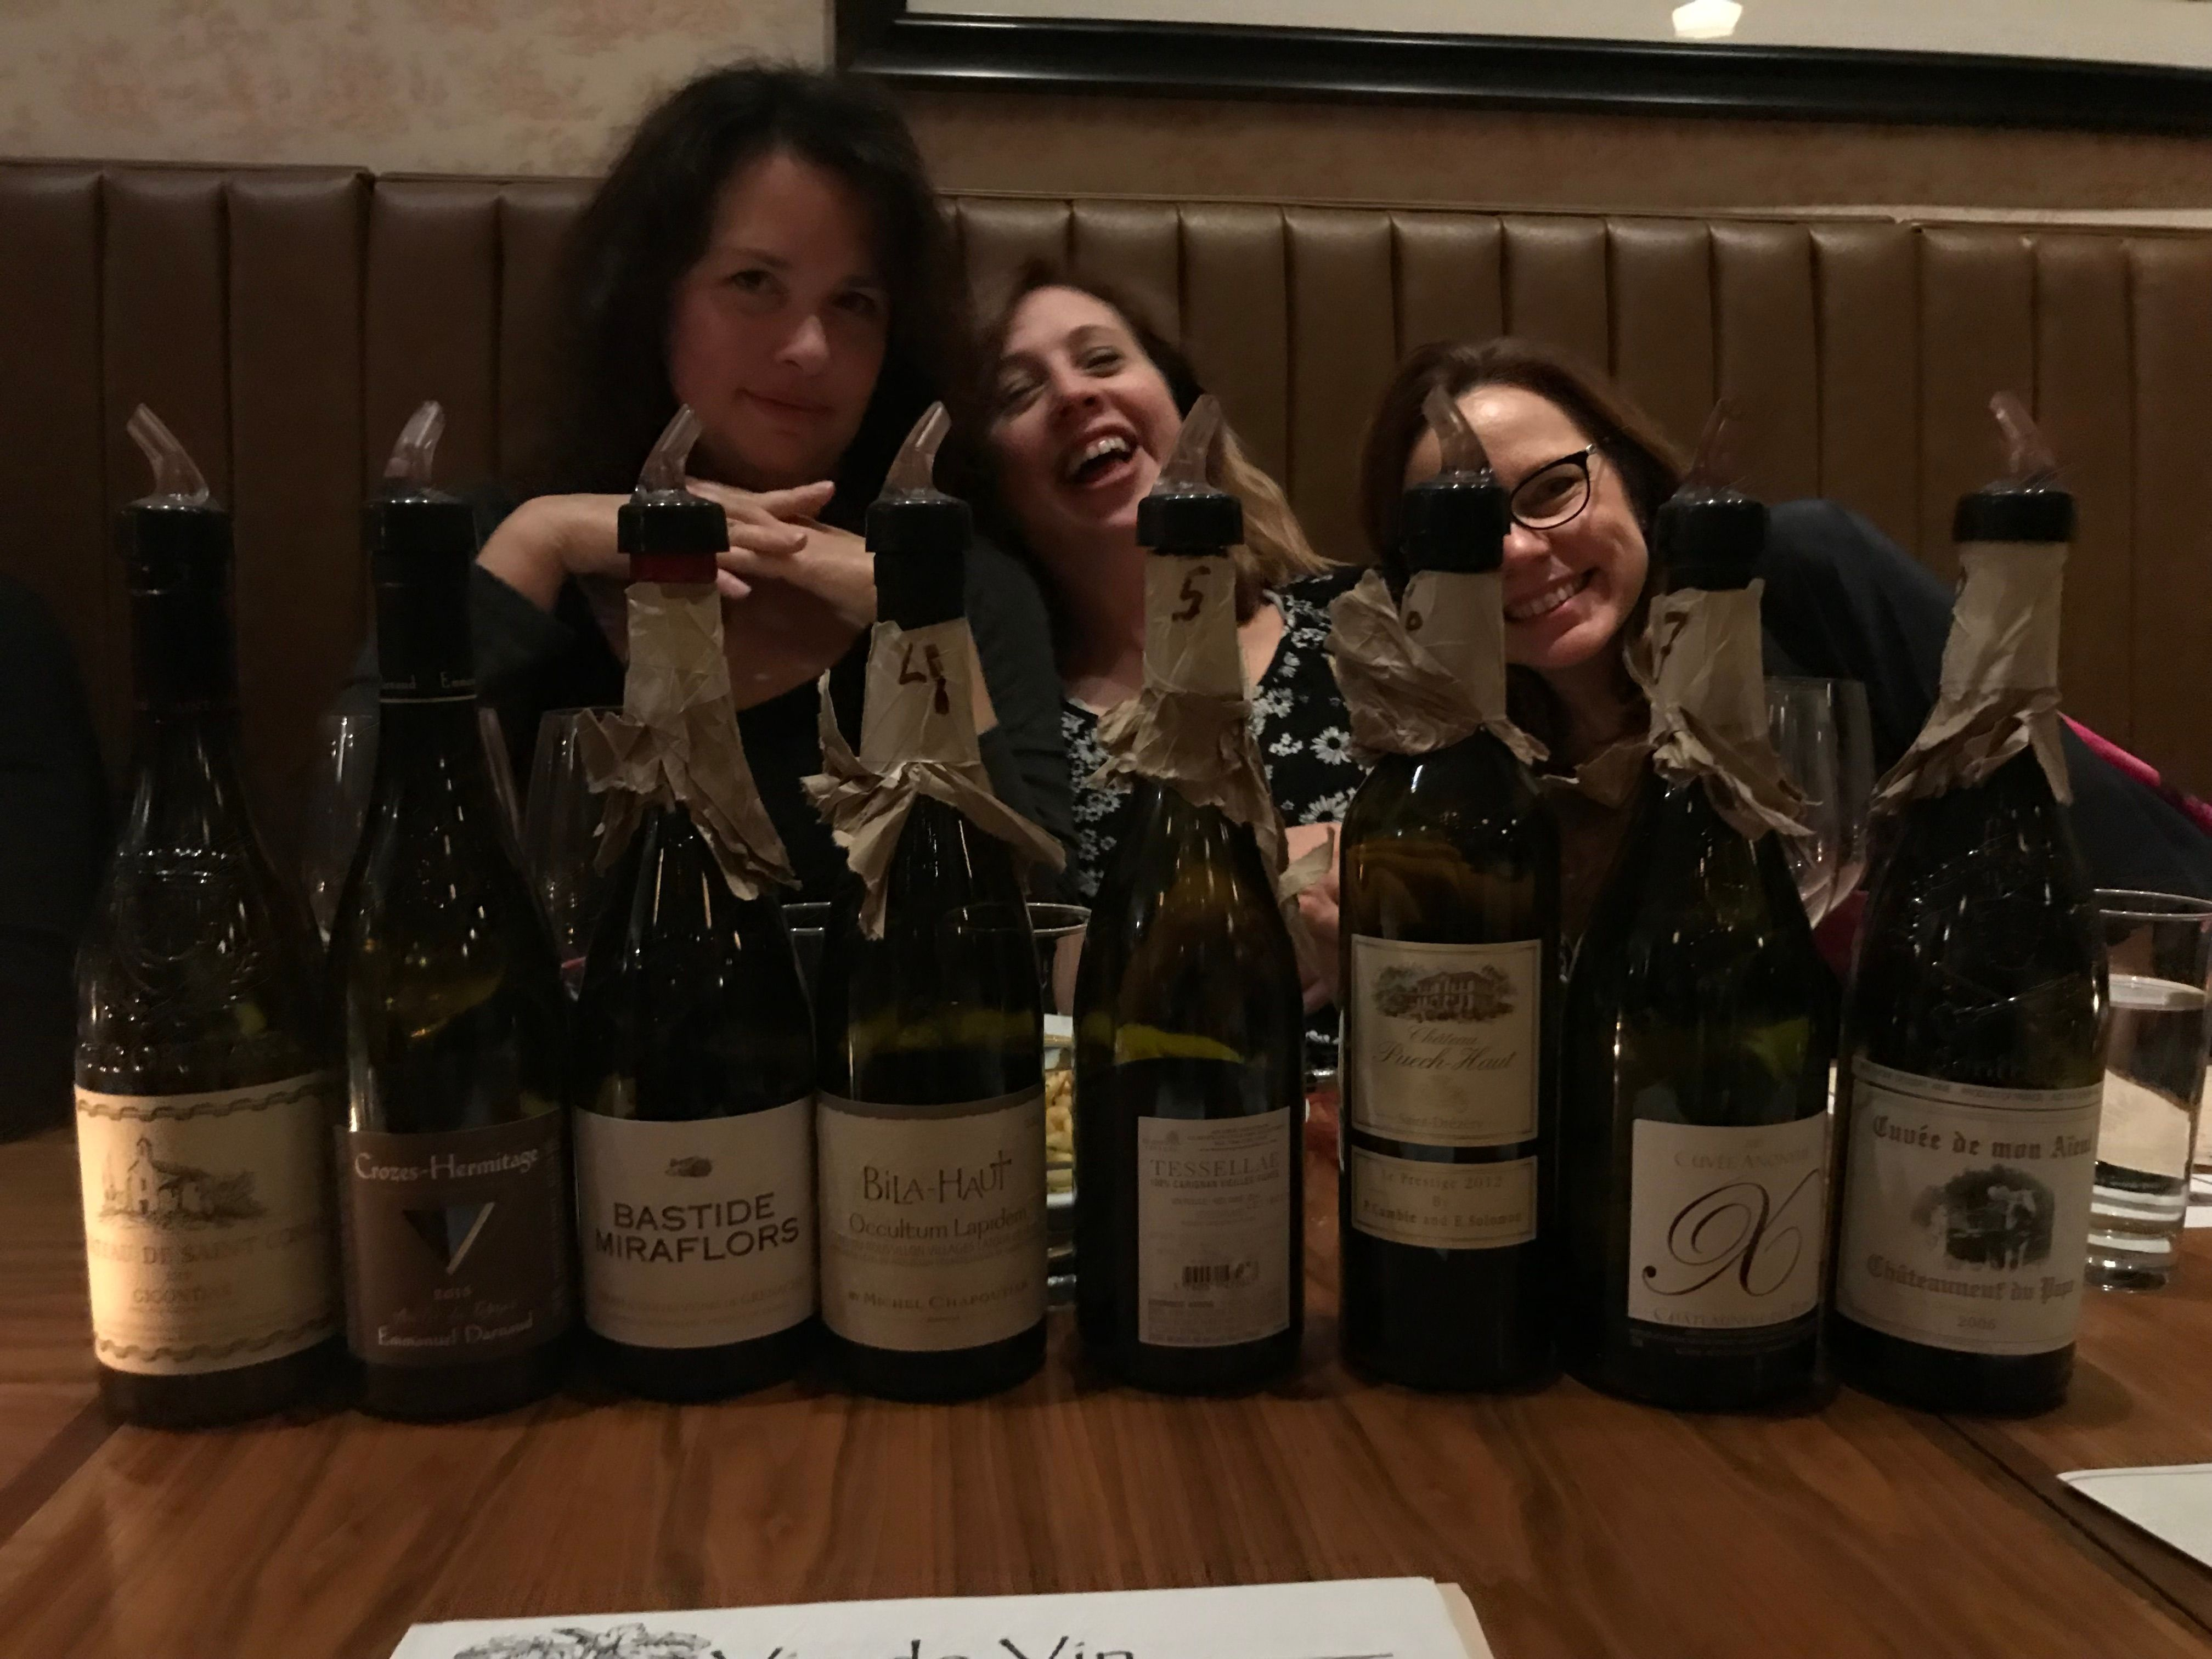 Portland Wine Tasting Group (PDX WTG)